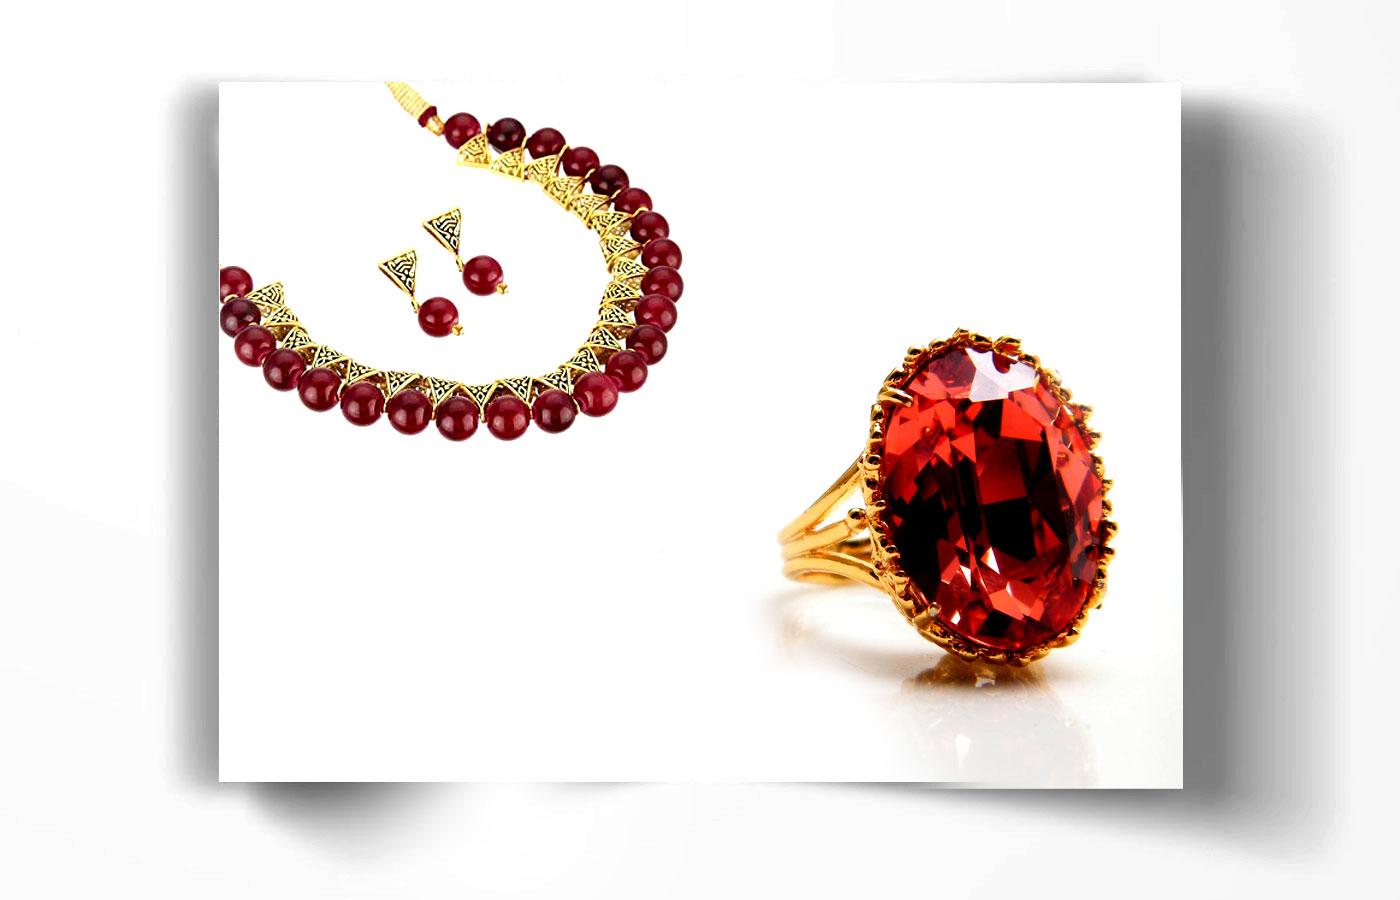 Ruby in Feng Shui 91a - رمز و رازهای یاقوت سرخ در فنگ شویی